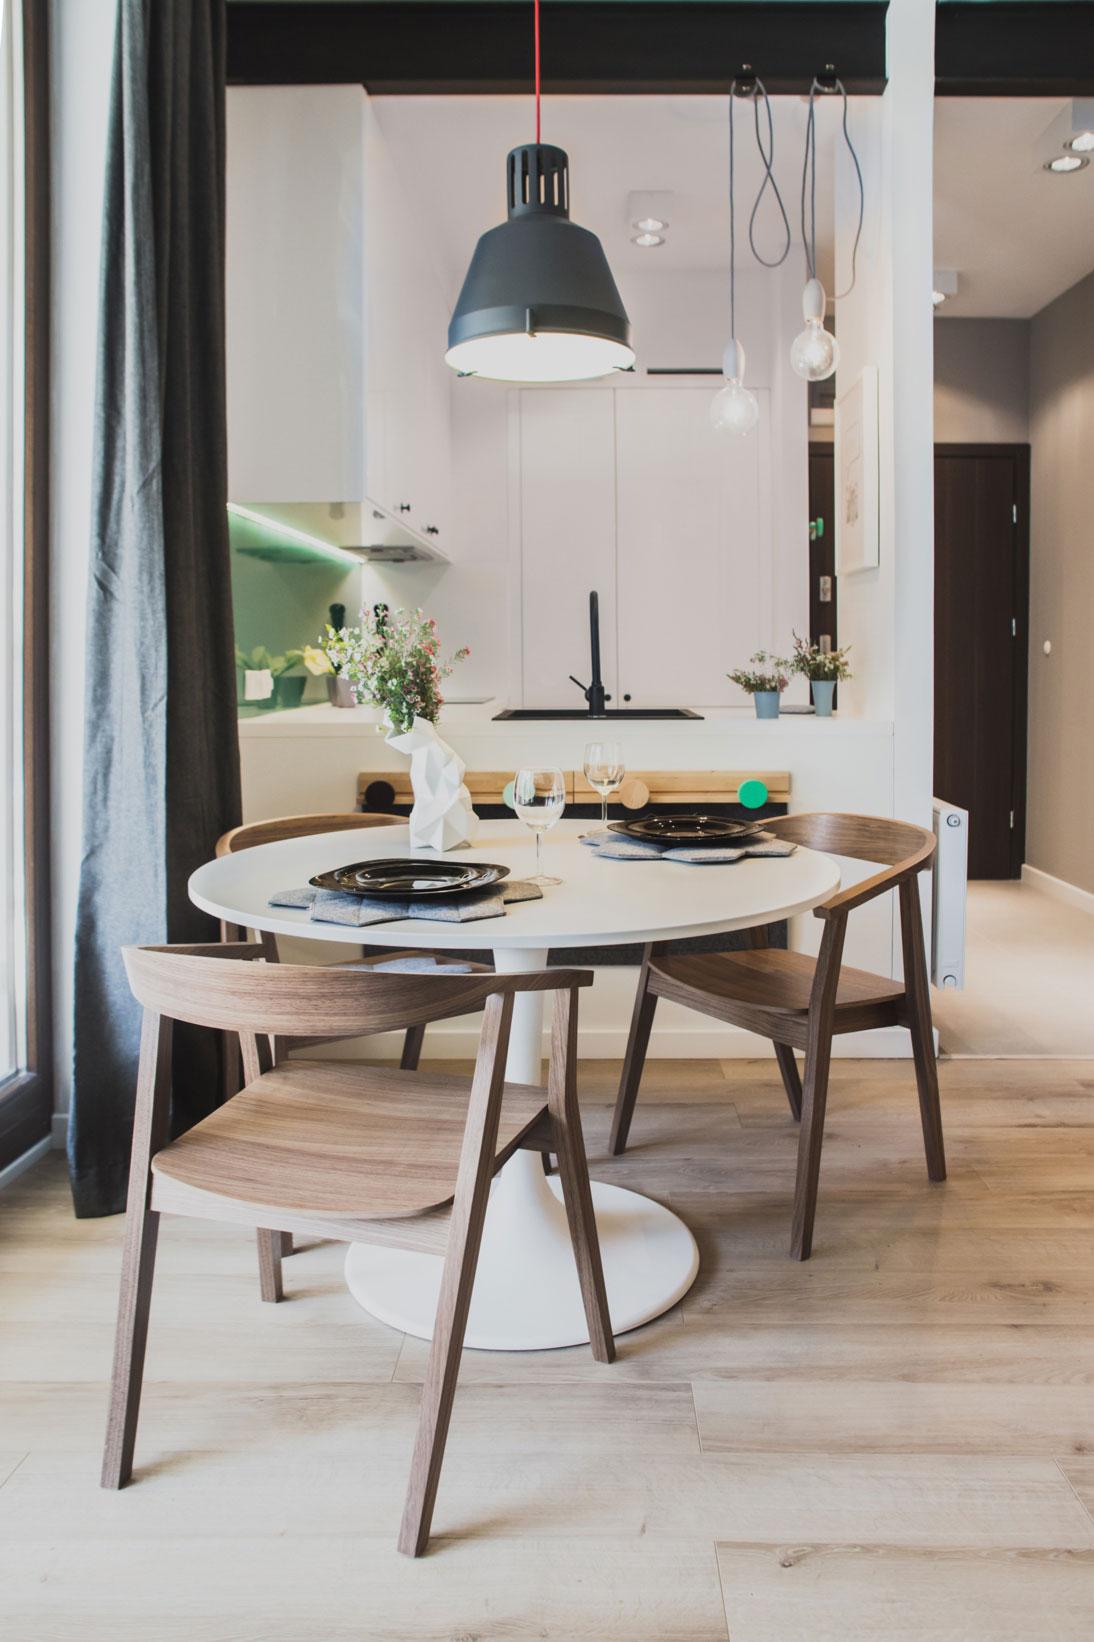 Szafarnia 2 Compact Apartment by Raca Architekci-15